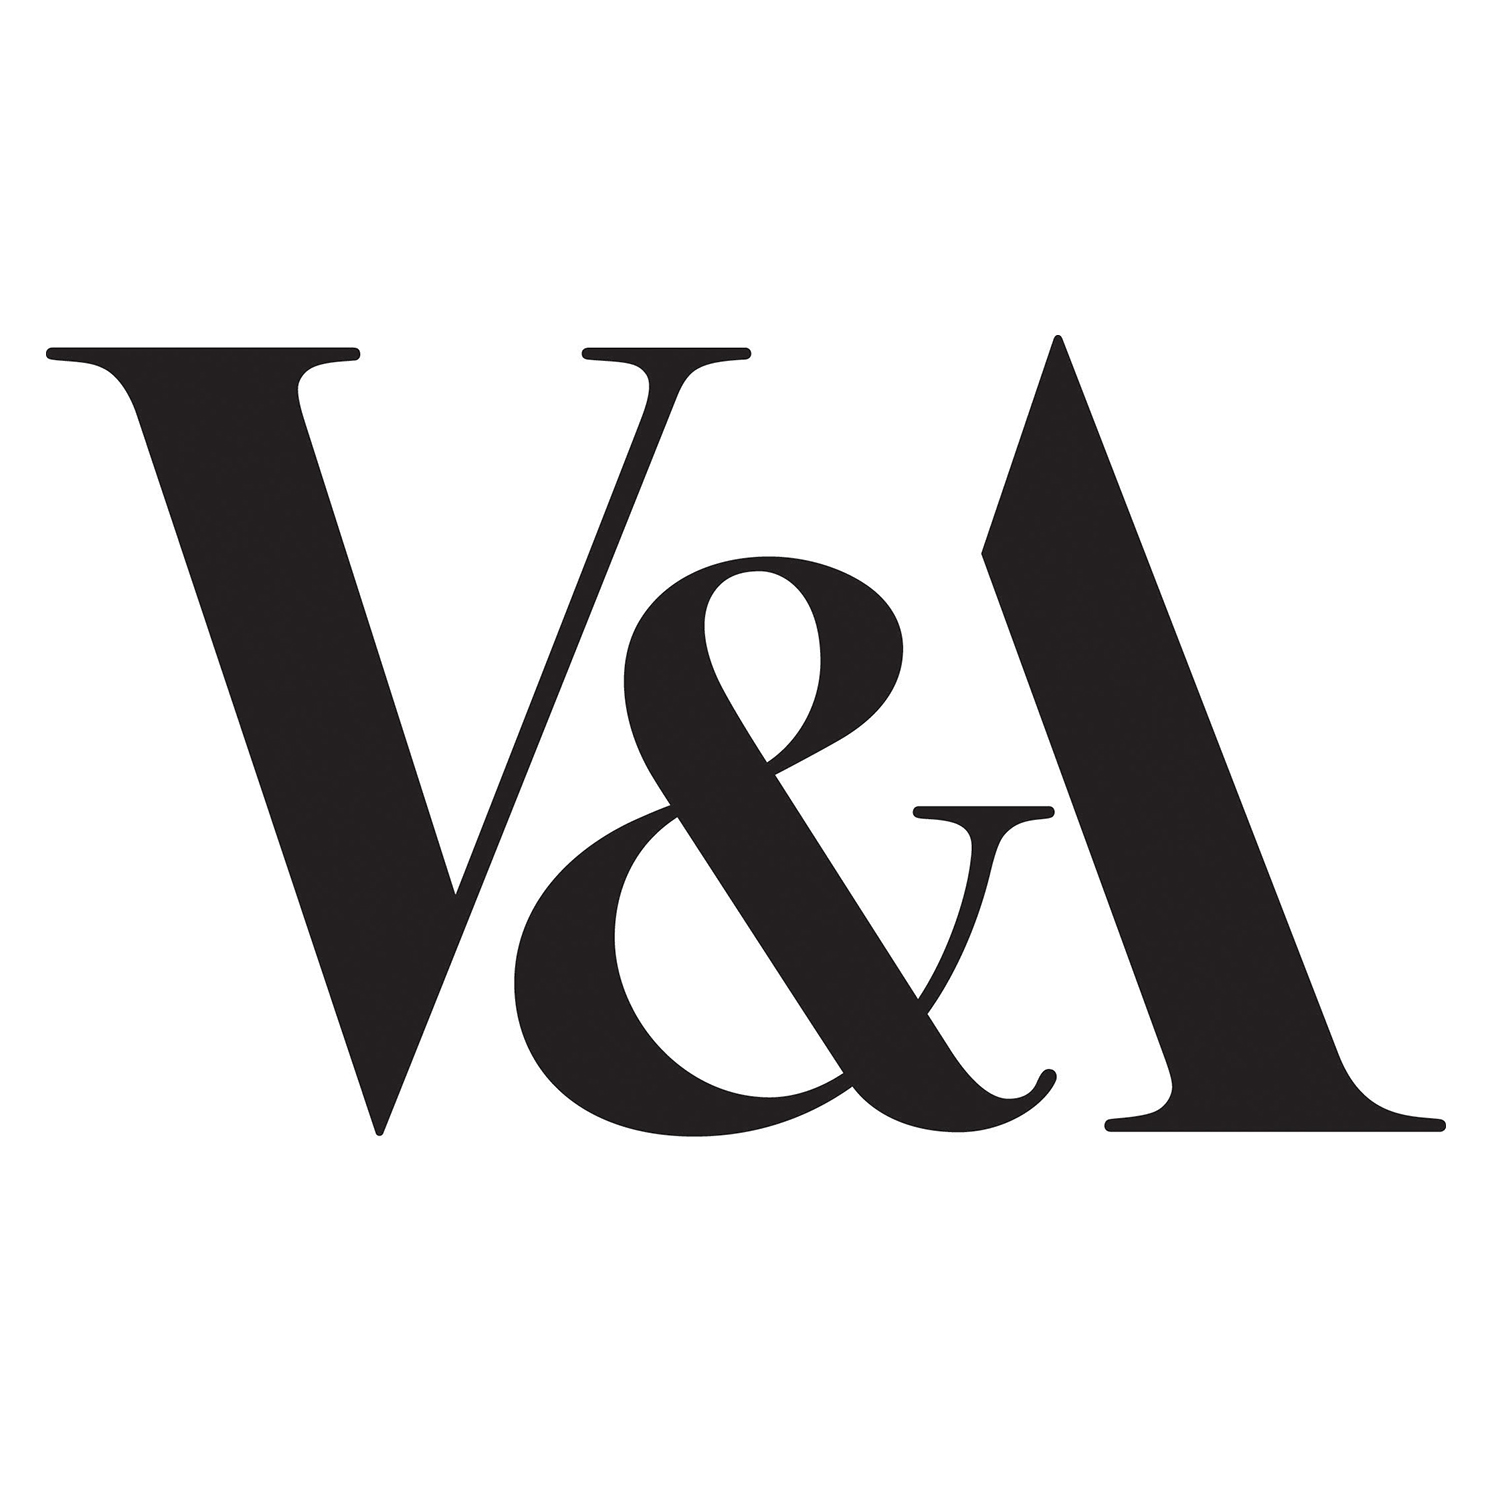 V&A – Clover Print Garden Multi-Tool in Presentation Gift Box